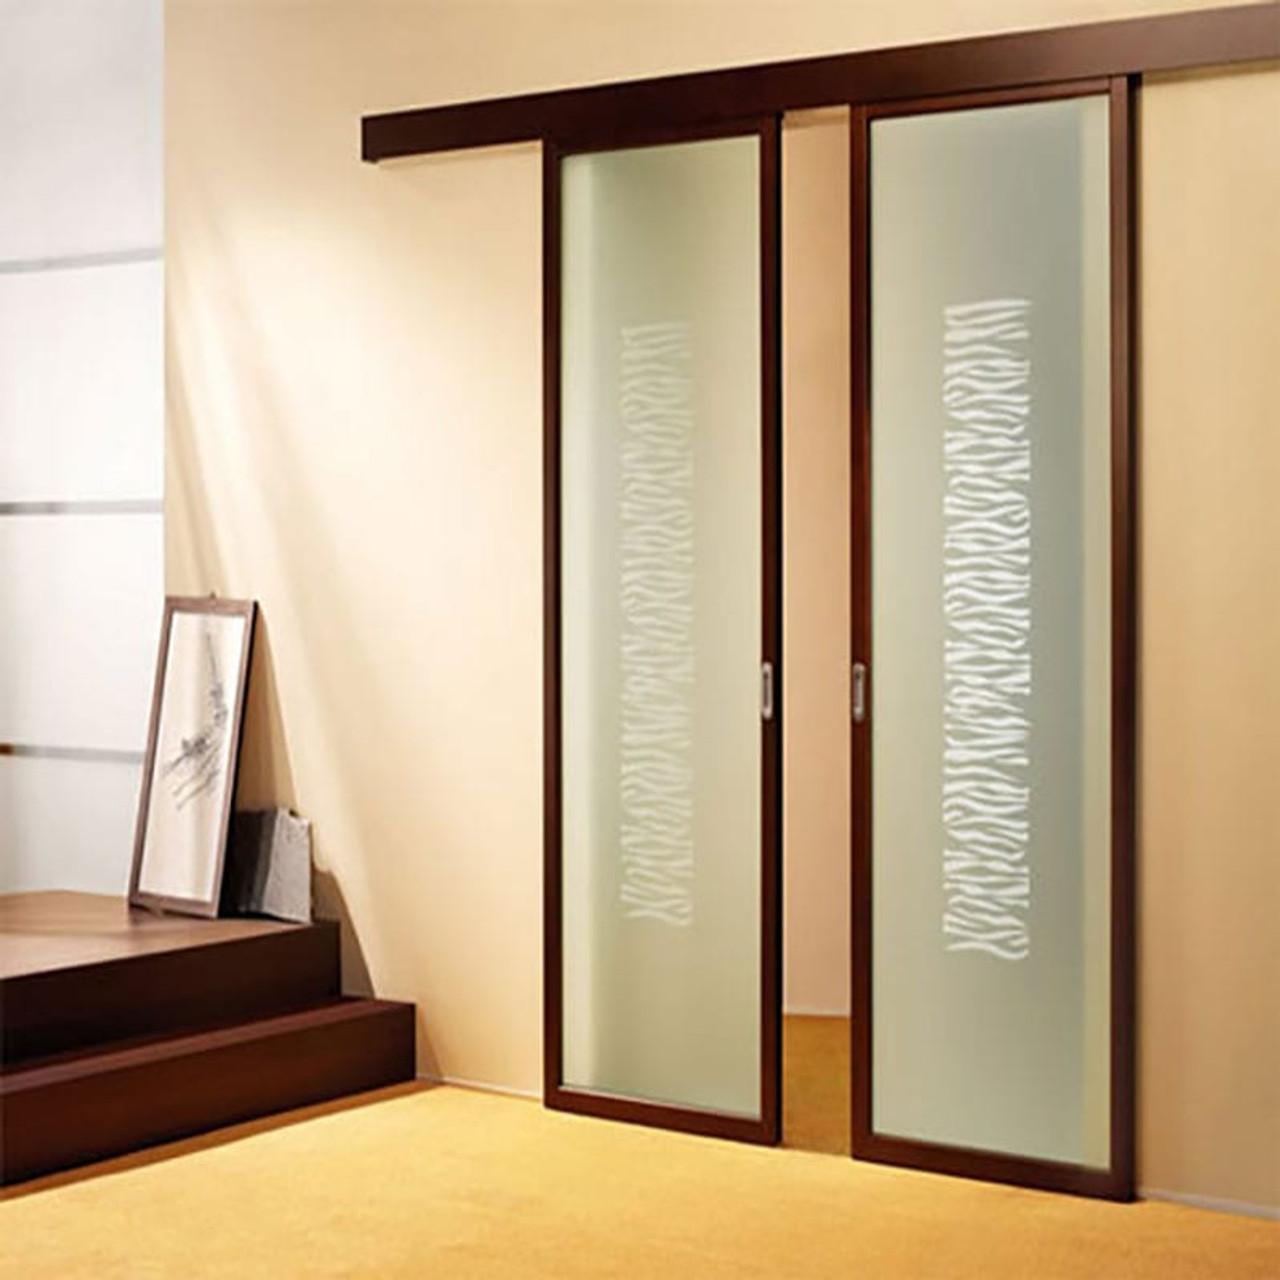 Hawa Junior 80/B Sliding Wood Door Fitting & Hawa Junior 80/B Sliding Wood Door Kit 11704 | Easy to Install